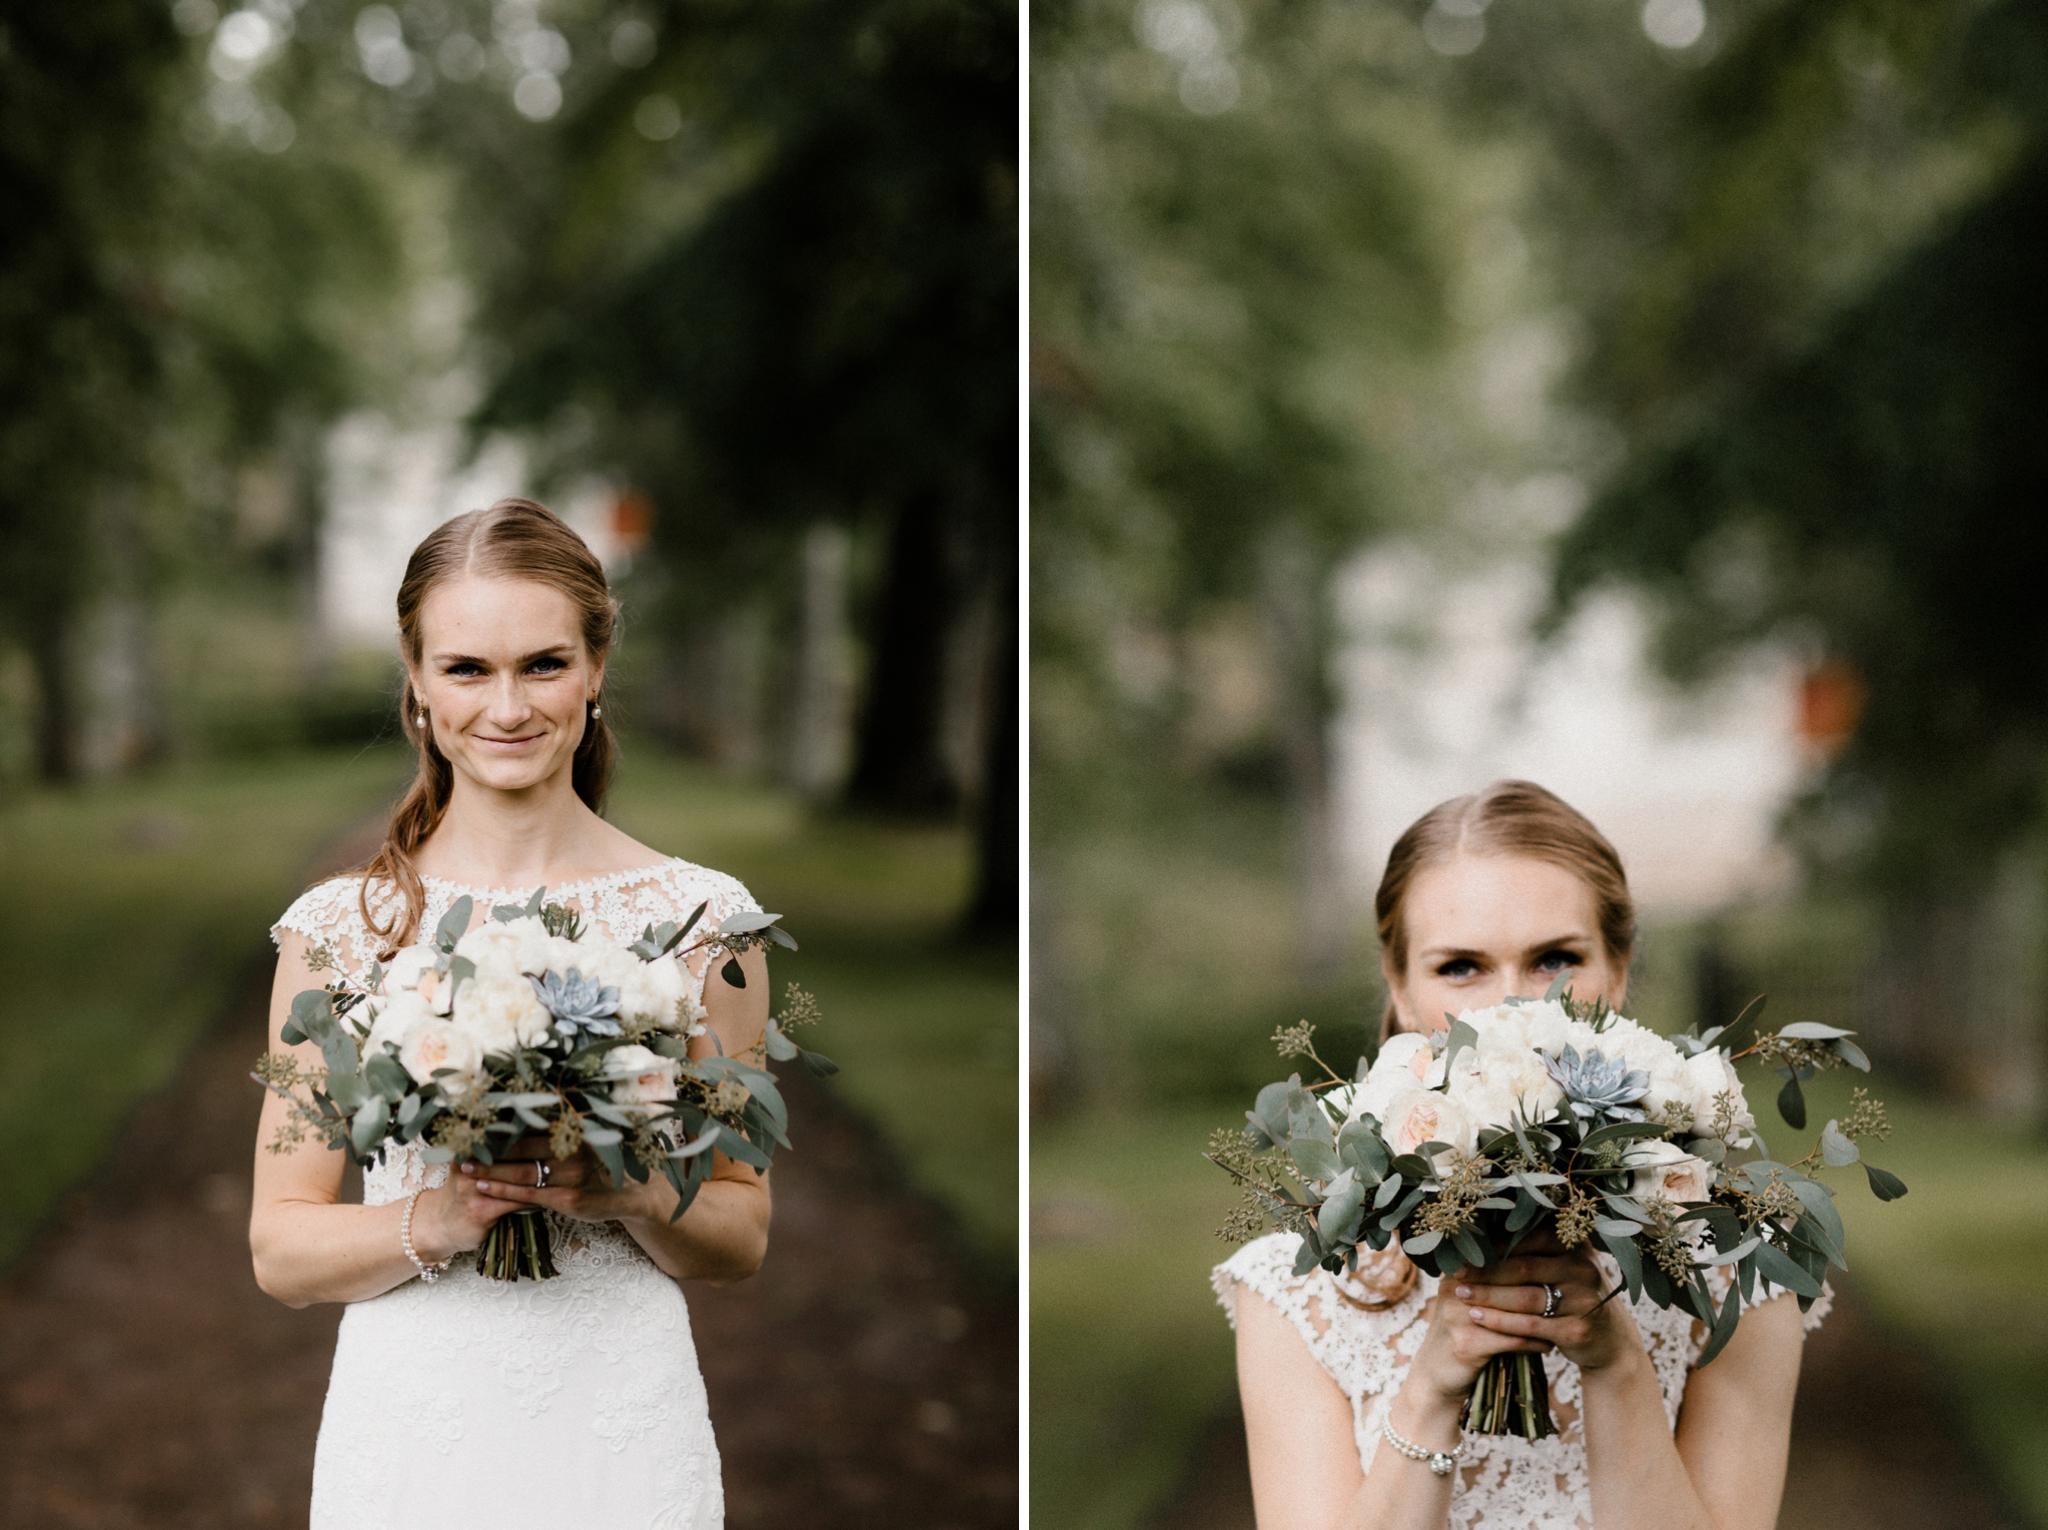 Jessica + Patrick | Fagervik | by Patrick Karkkolainen Wedding Photography-51.jpg